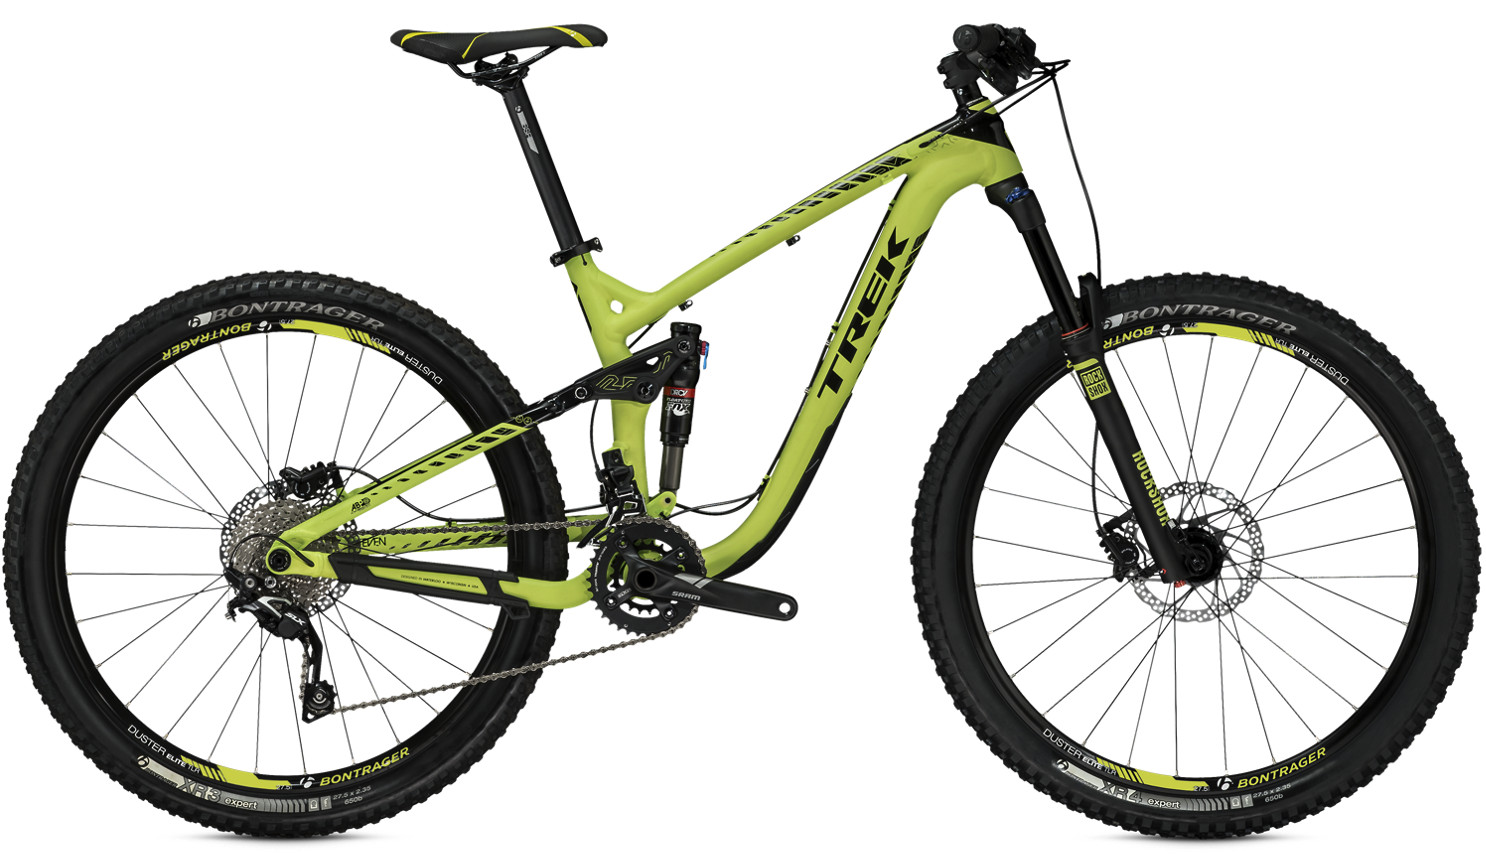 2015 trek remedy 7 27 5 bike reviews comparisons specs. Black Bedroom Furniture Sets. Home Design Ideas